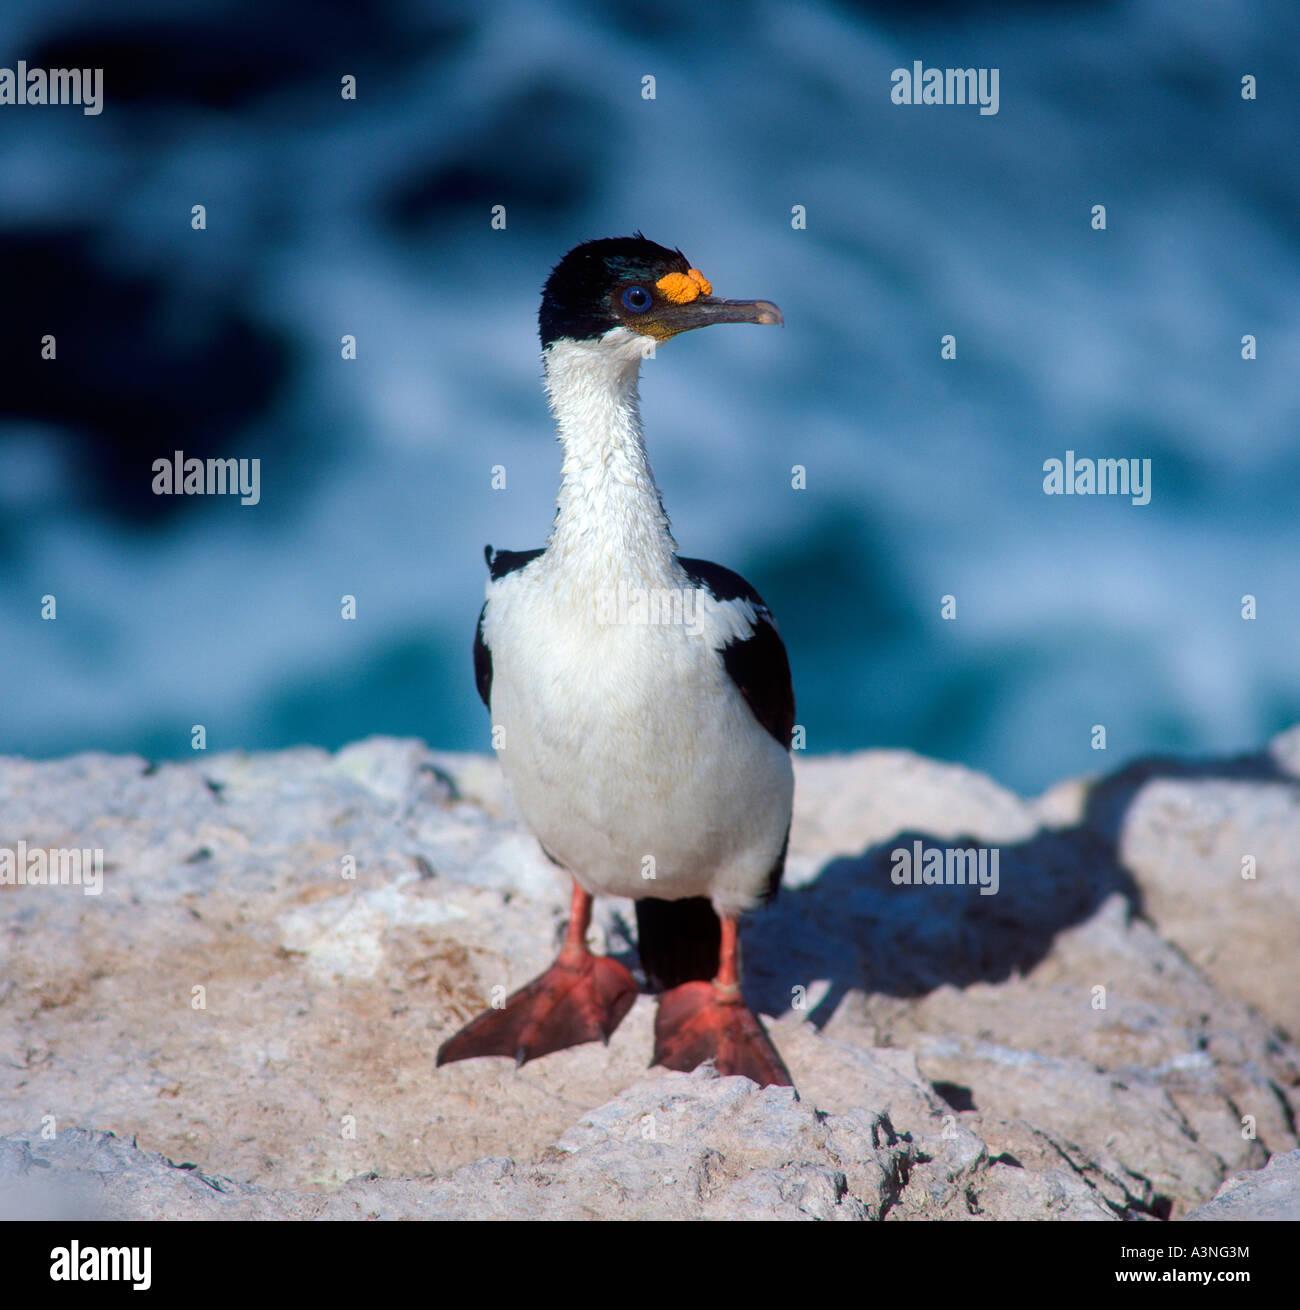 Cormorant King Wallpapers Cormorant King King Cormorant